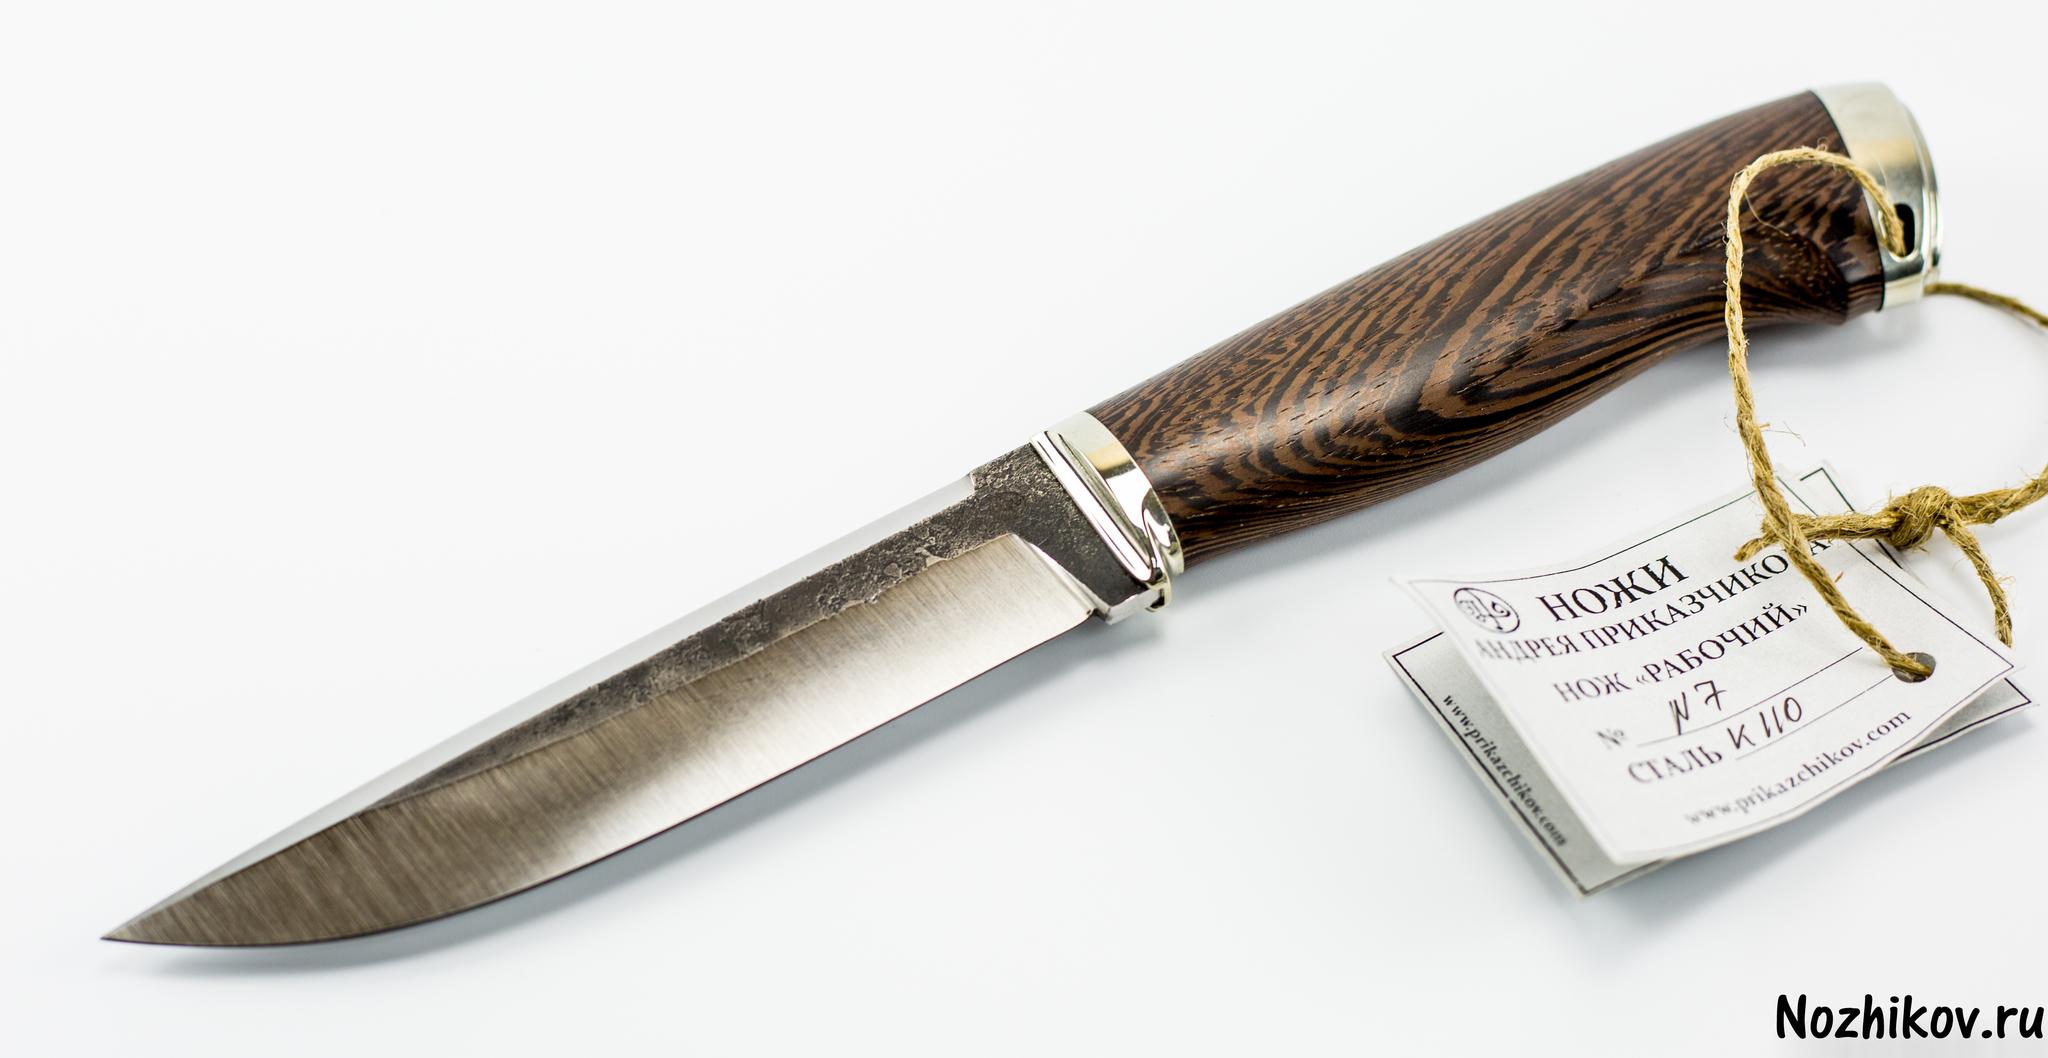 цена Нож Рабочий №7 из K110, от Приказчикова